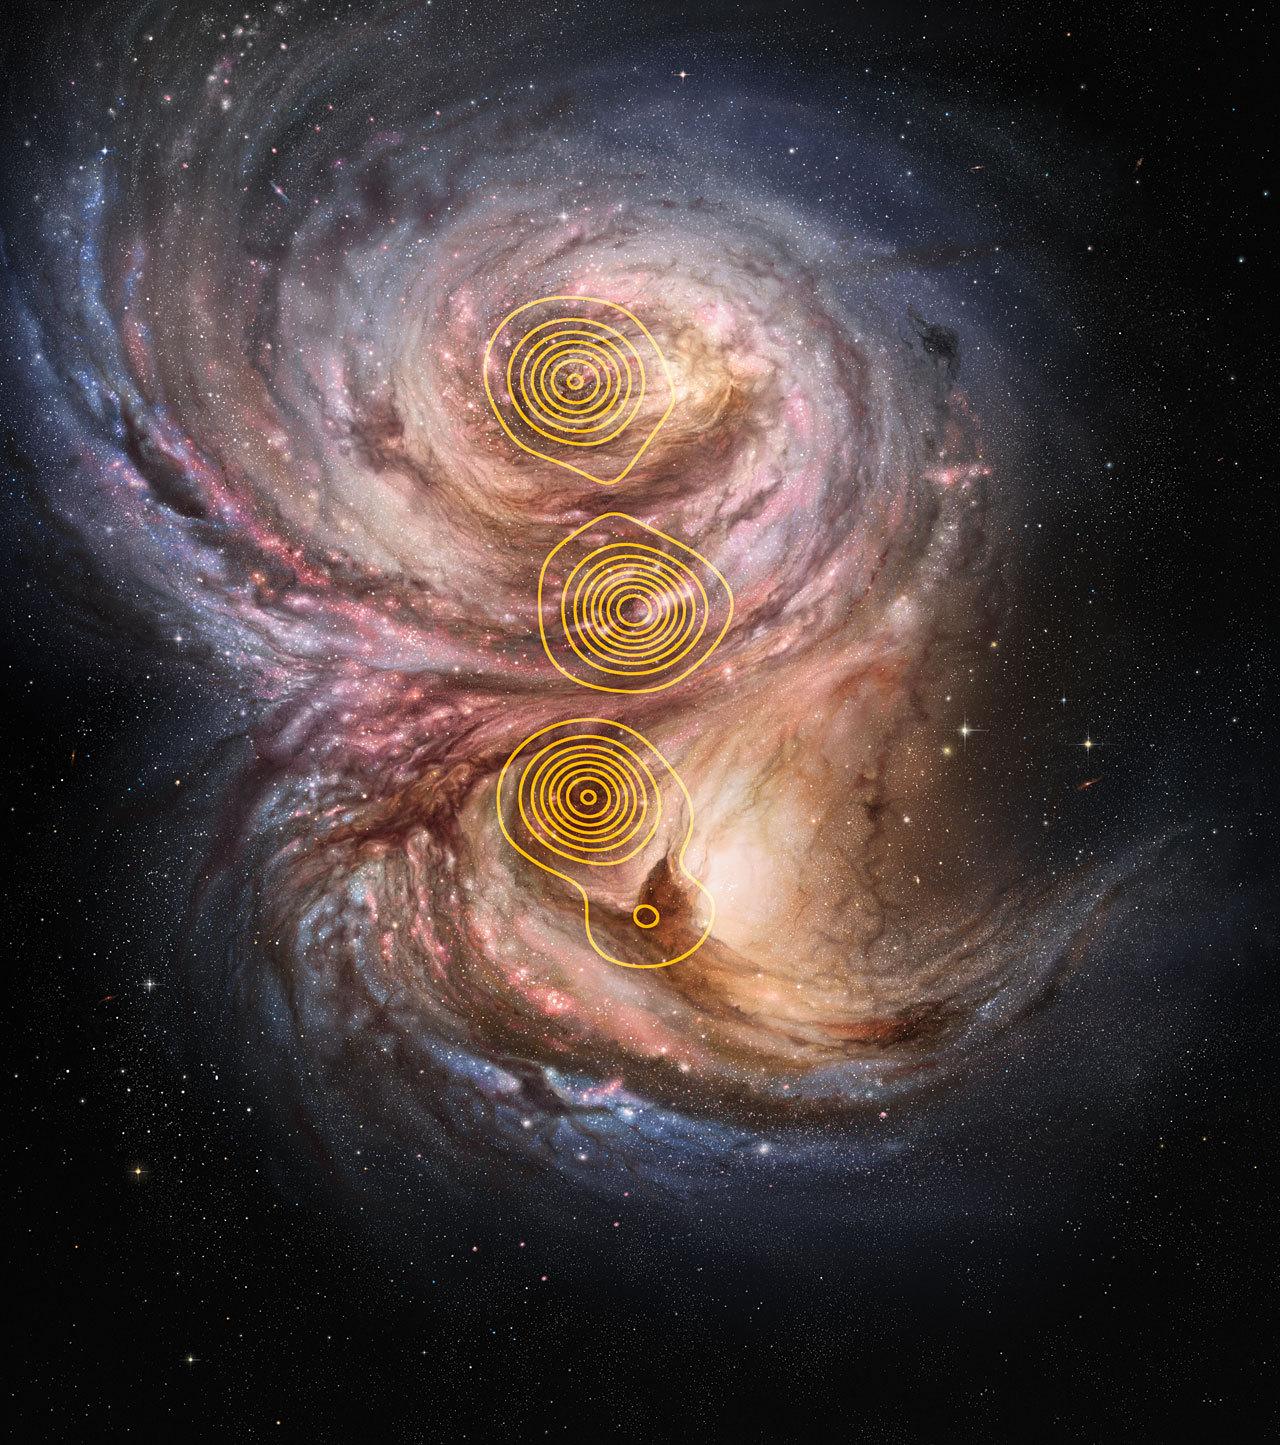 Star factories in the distant Universe Credit: ESO/M. Kornmesser/M. Swinbank et al.